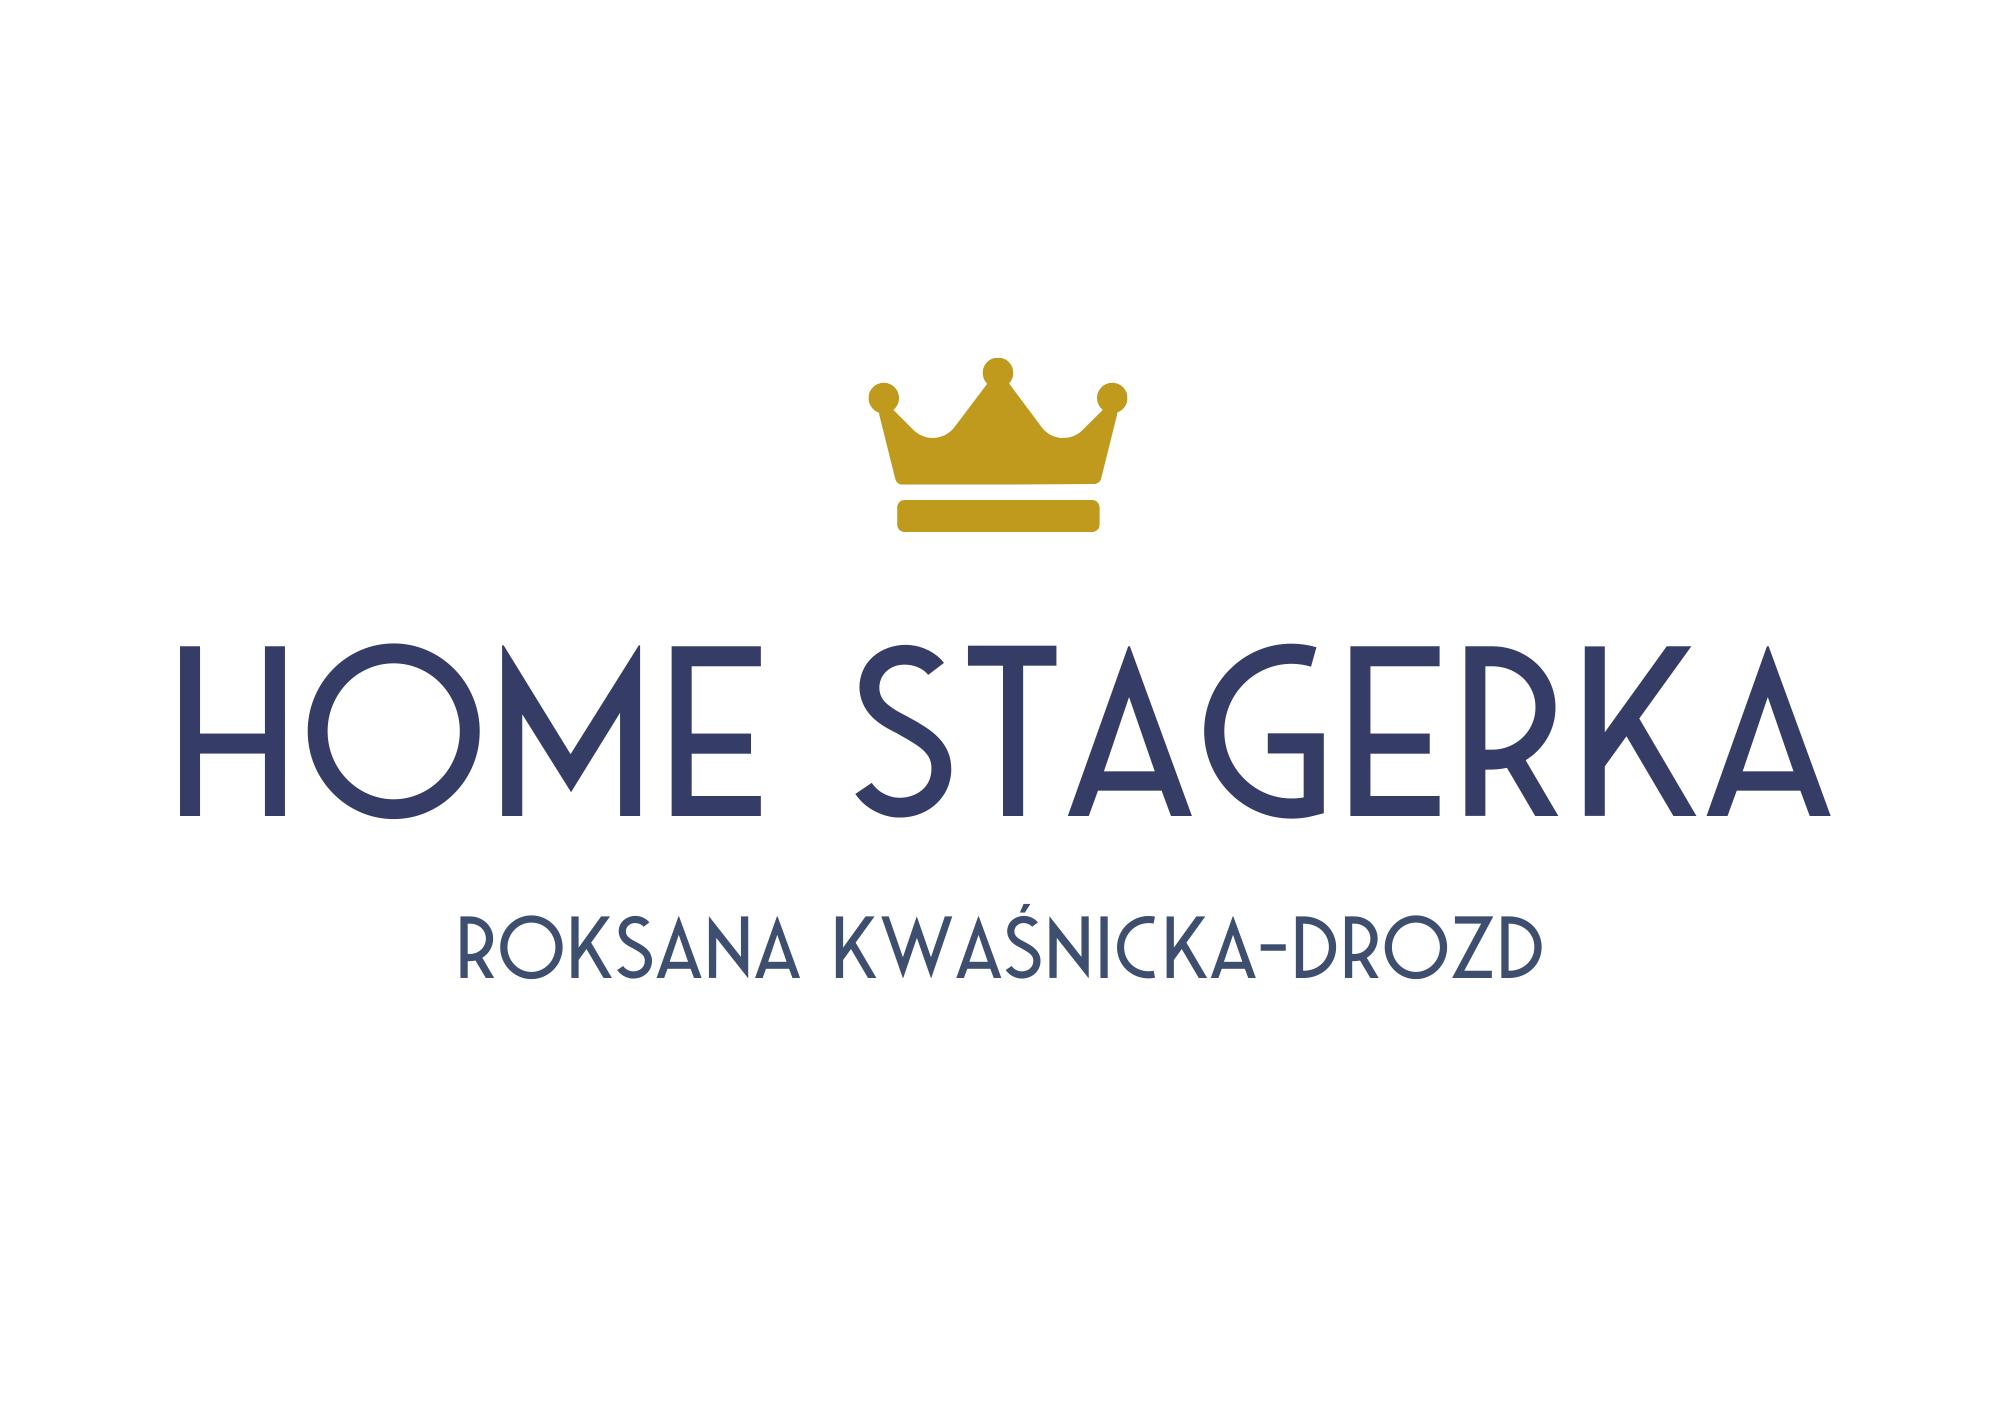 HOMESTAGERKA.PL Roksana Kwaśnicka-Drozd